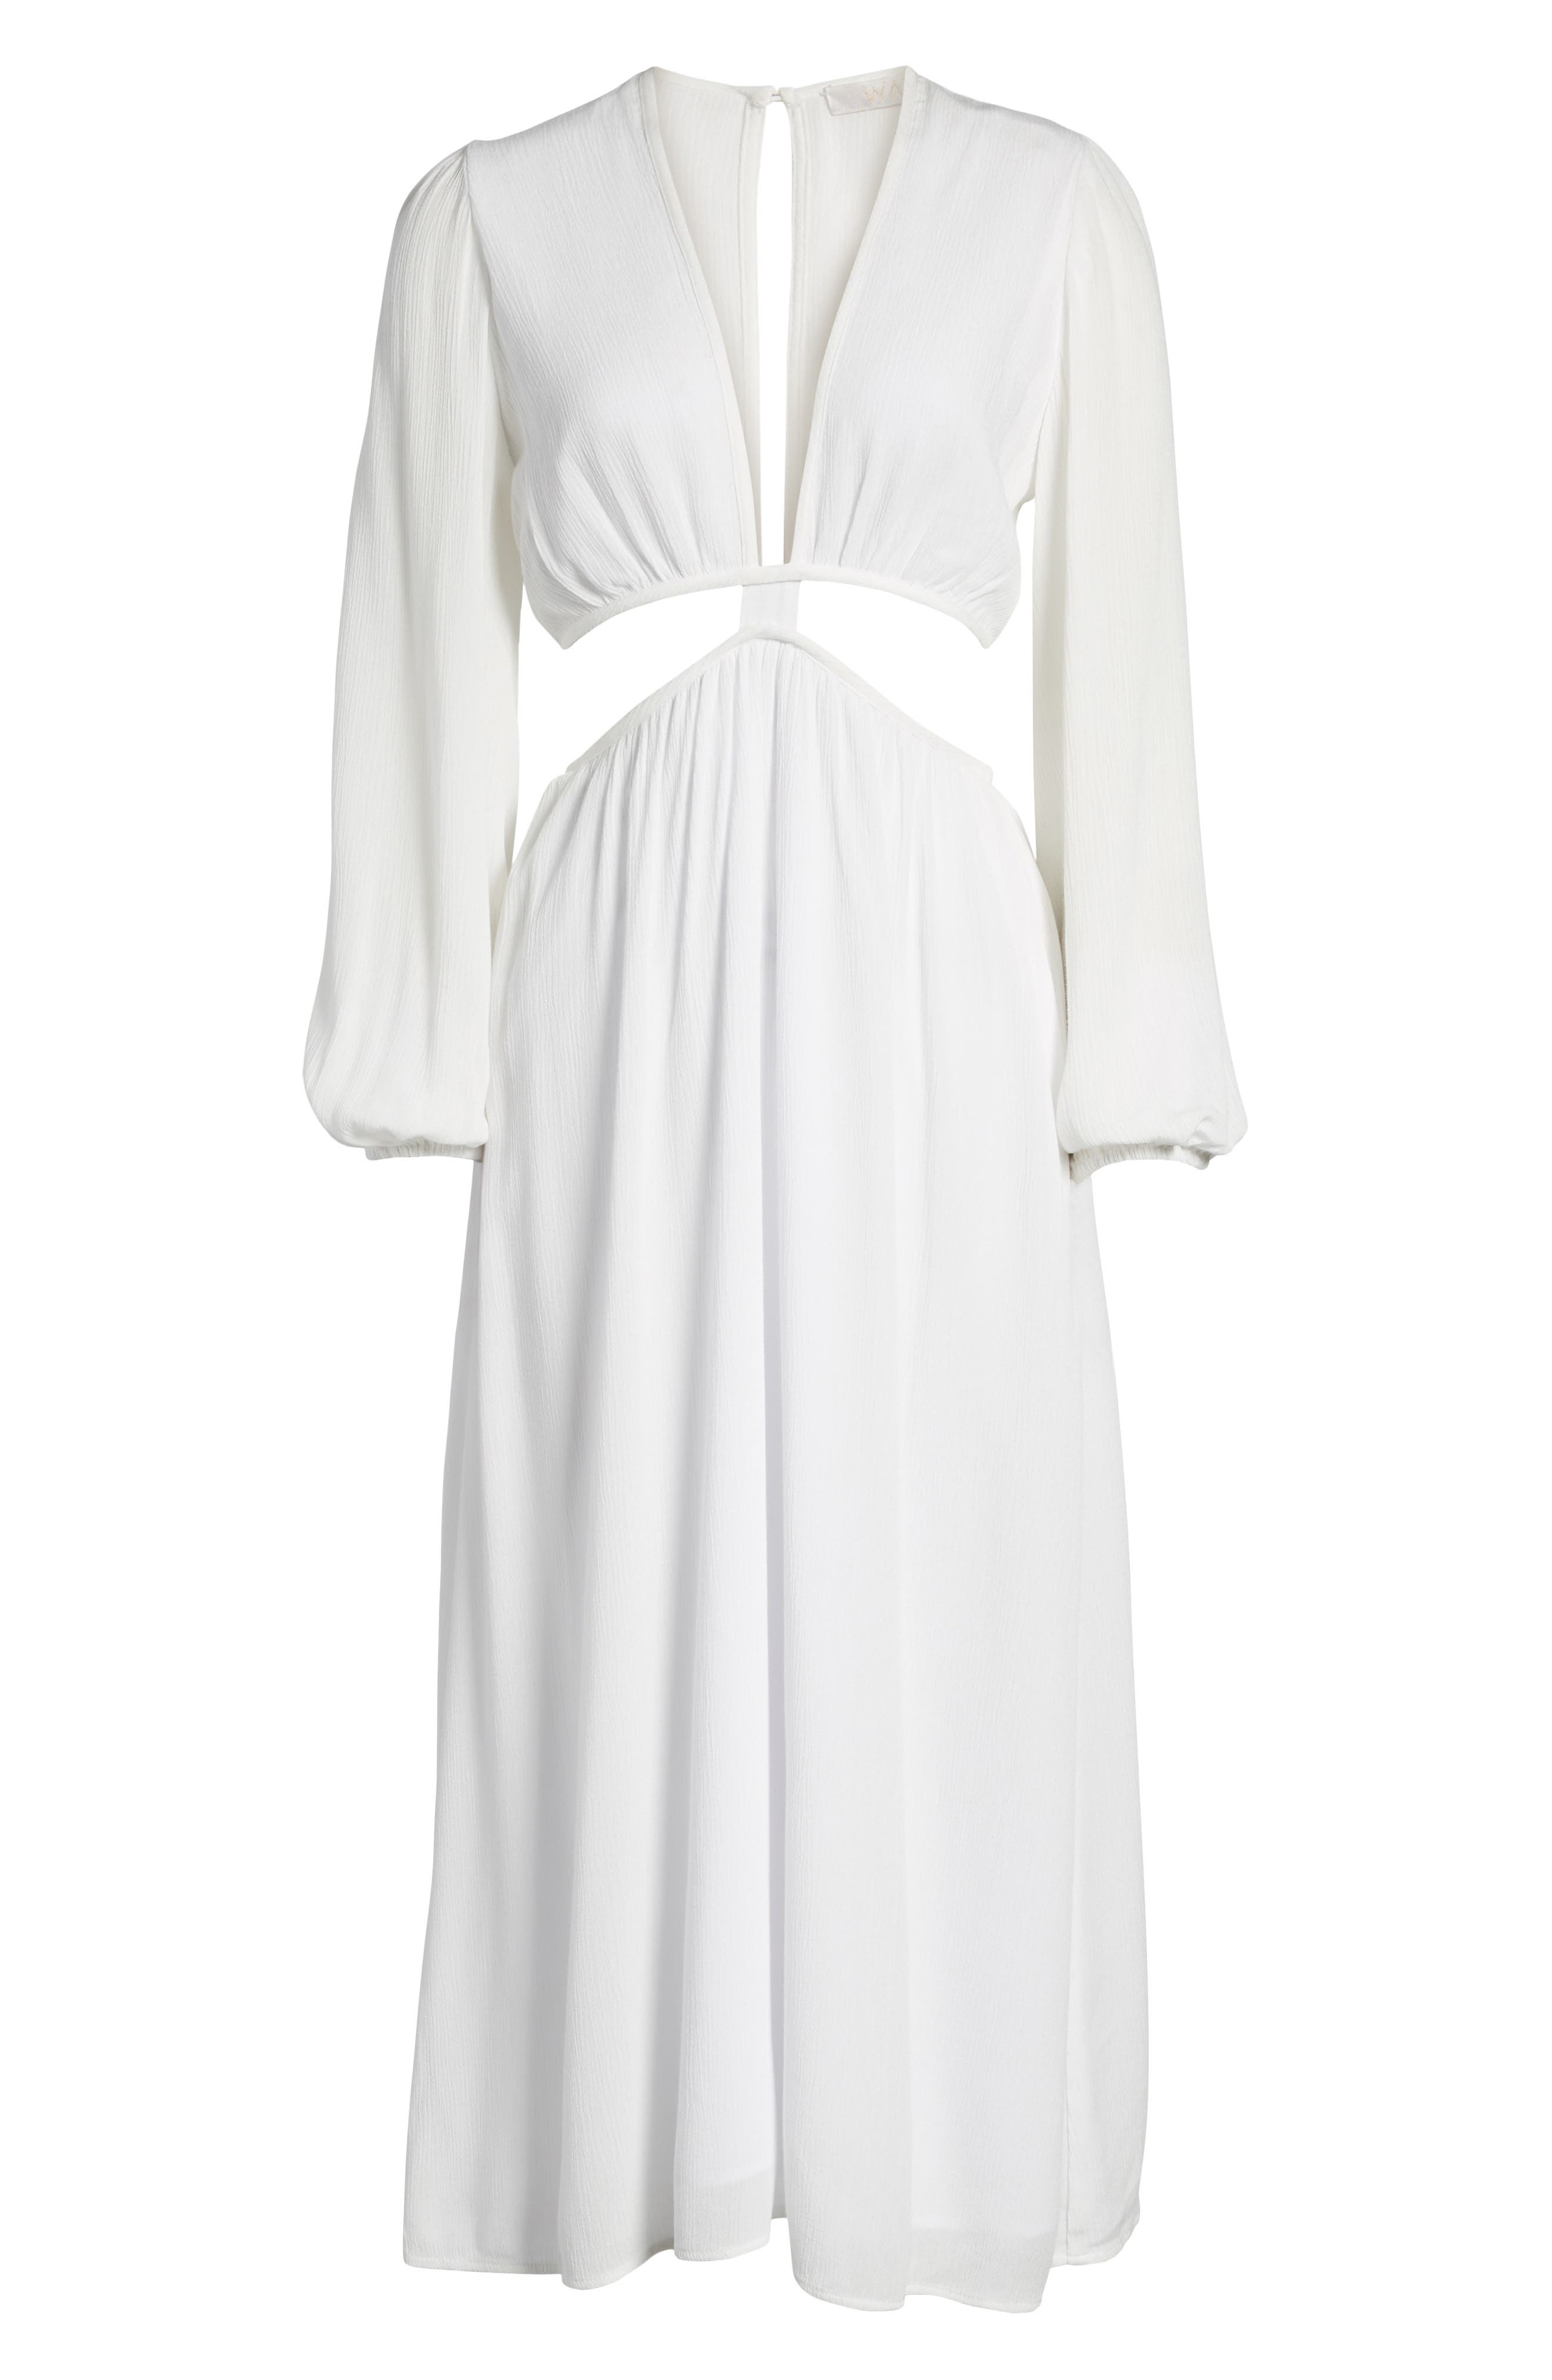 Babylon Cutout Dress,                             Alternate thumbnail 7, color,                             Ivory